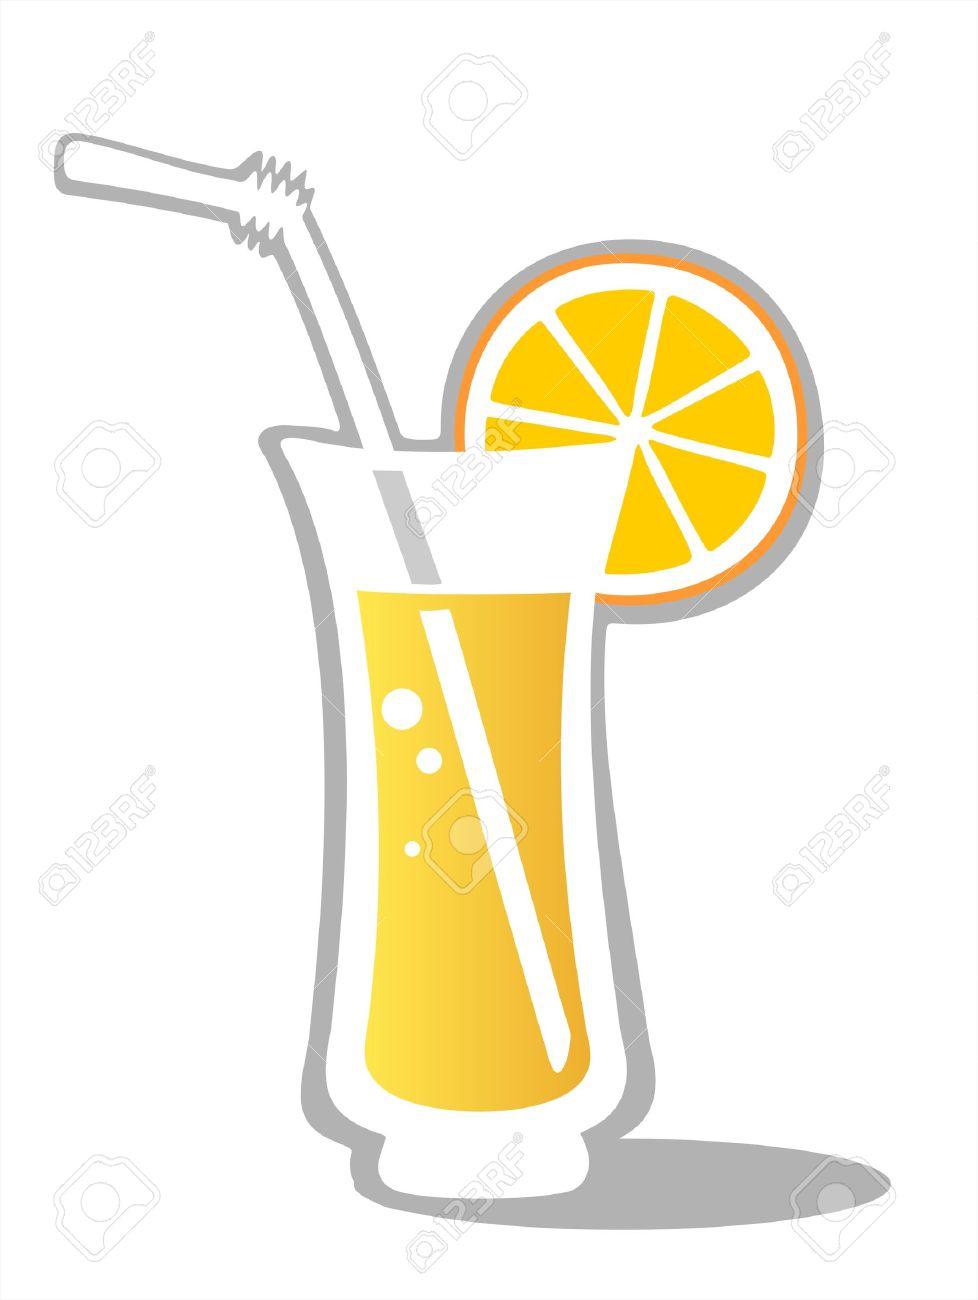 Cartoon Juice Glass Orange Juice Glass Isolated on